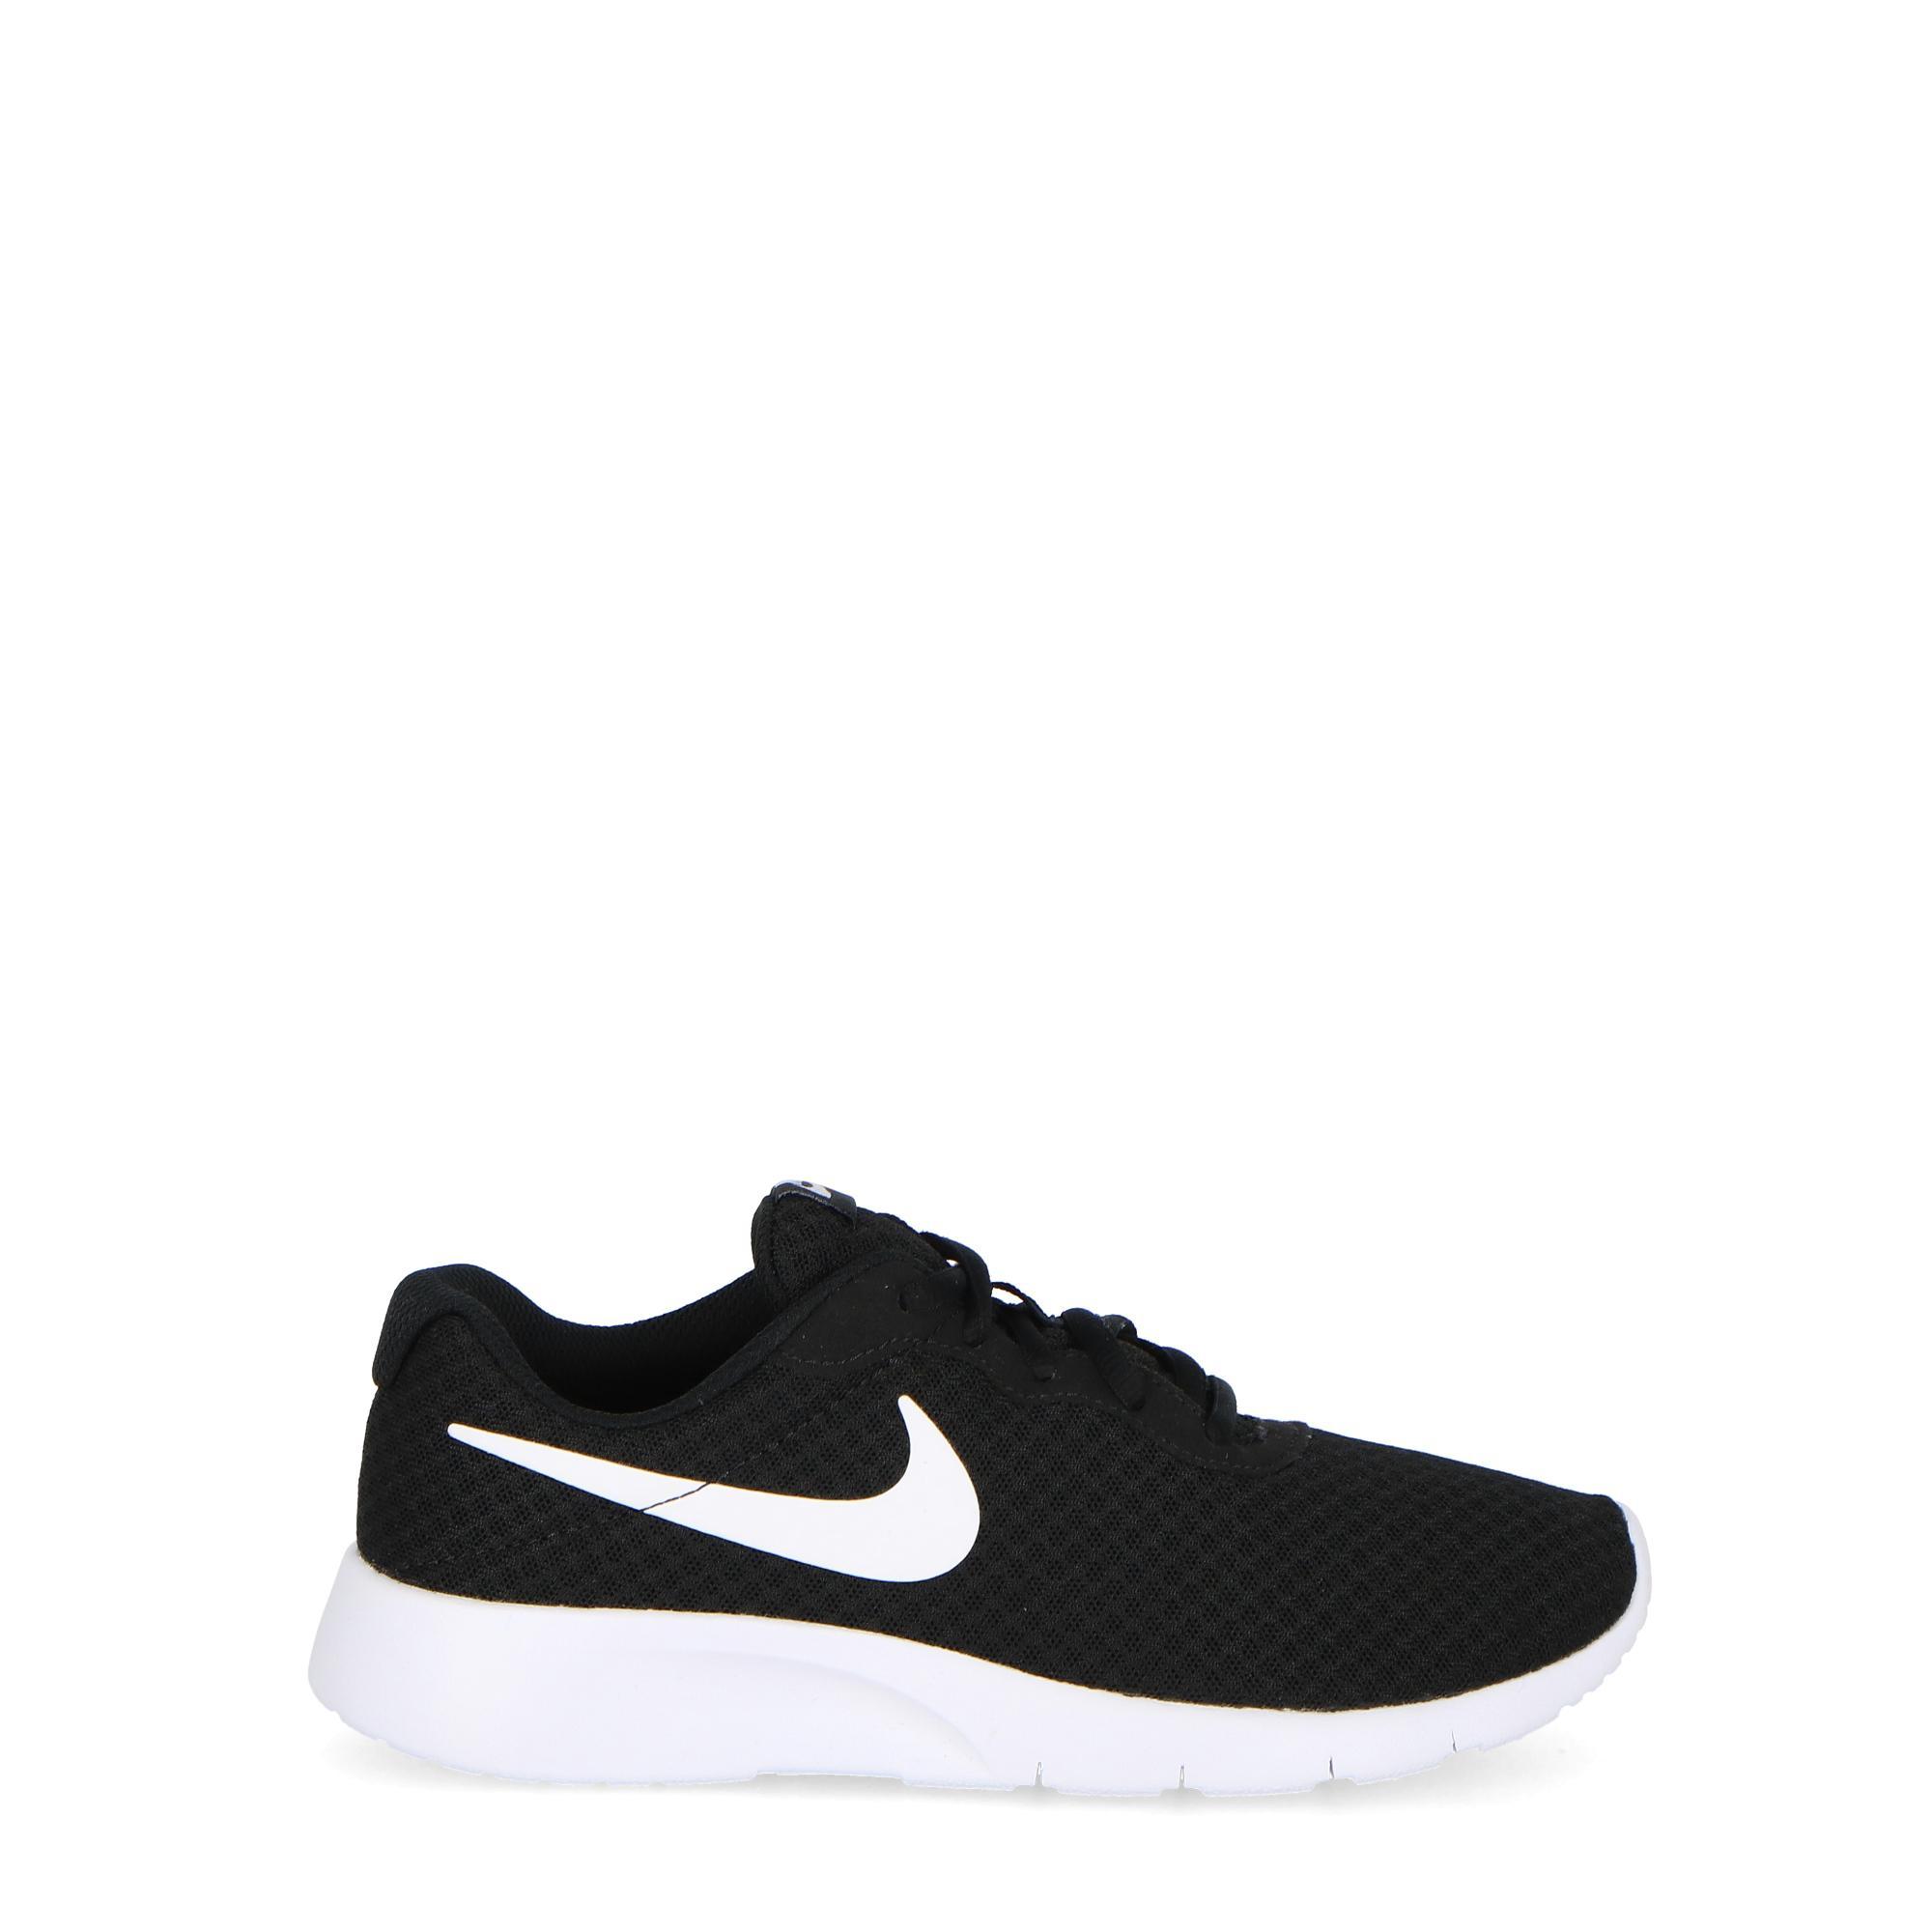 newest 47b7b a21c7 Nike Tanjun (gs) - Kids Black white